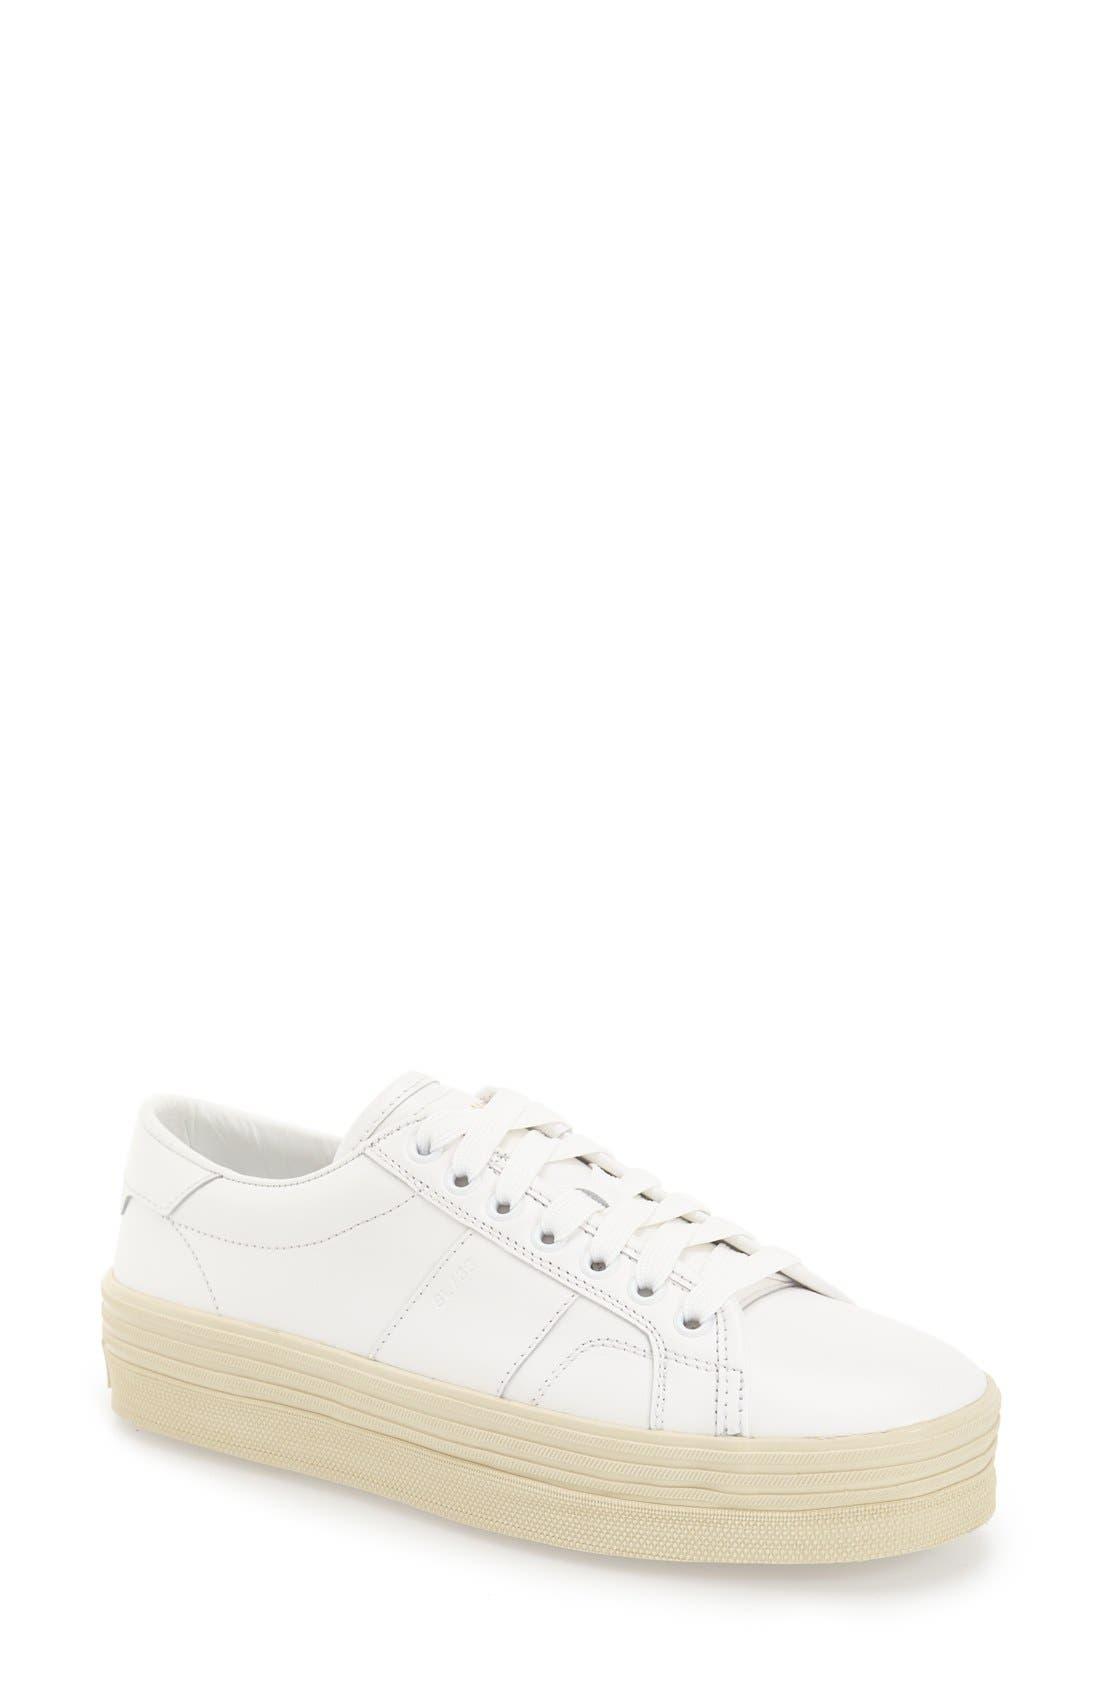 Double Sole Sneaker,                         Main,                         color, 100